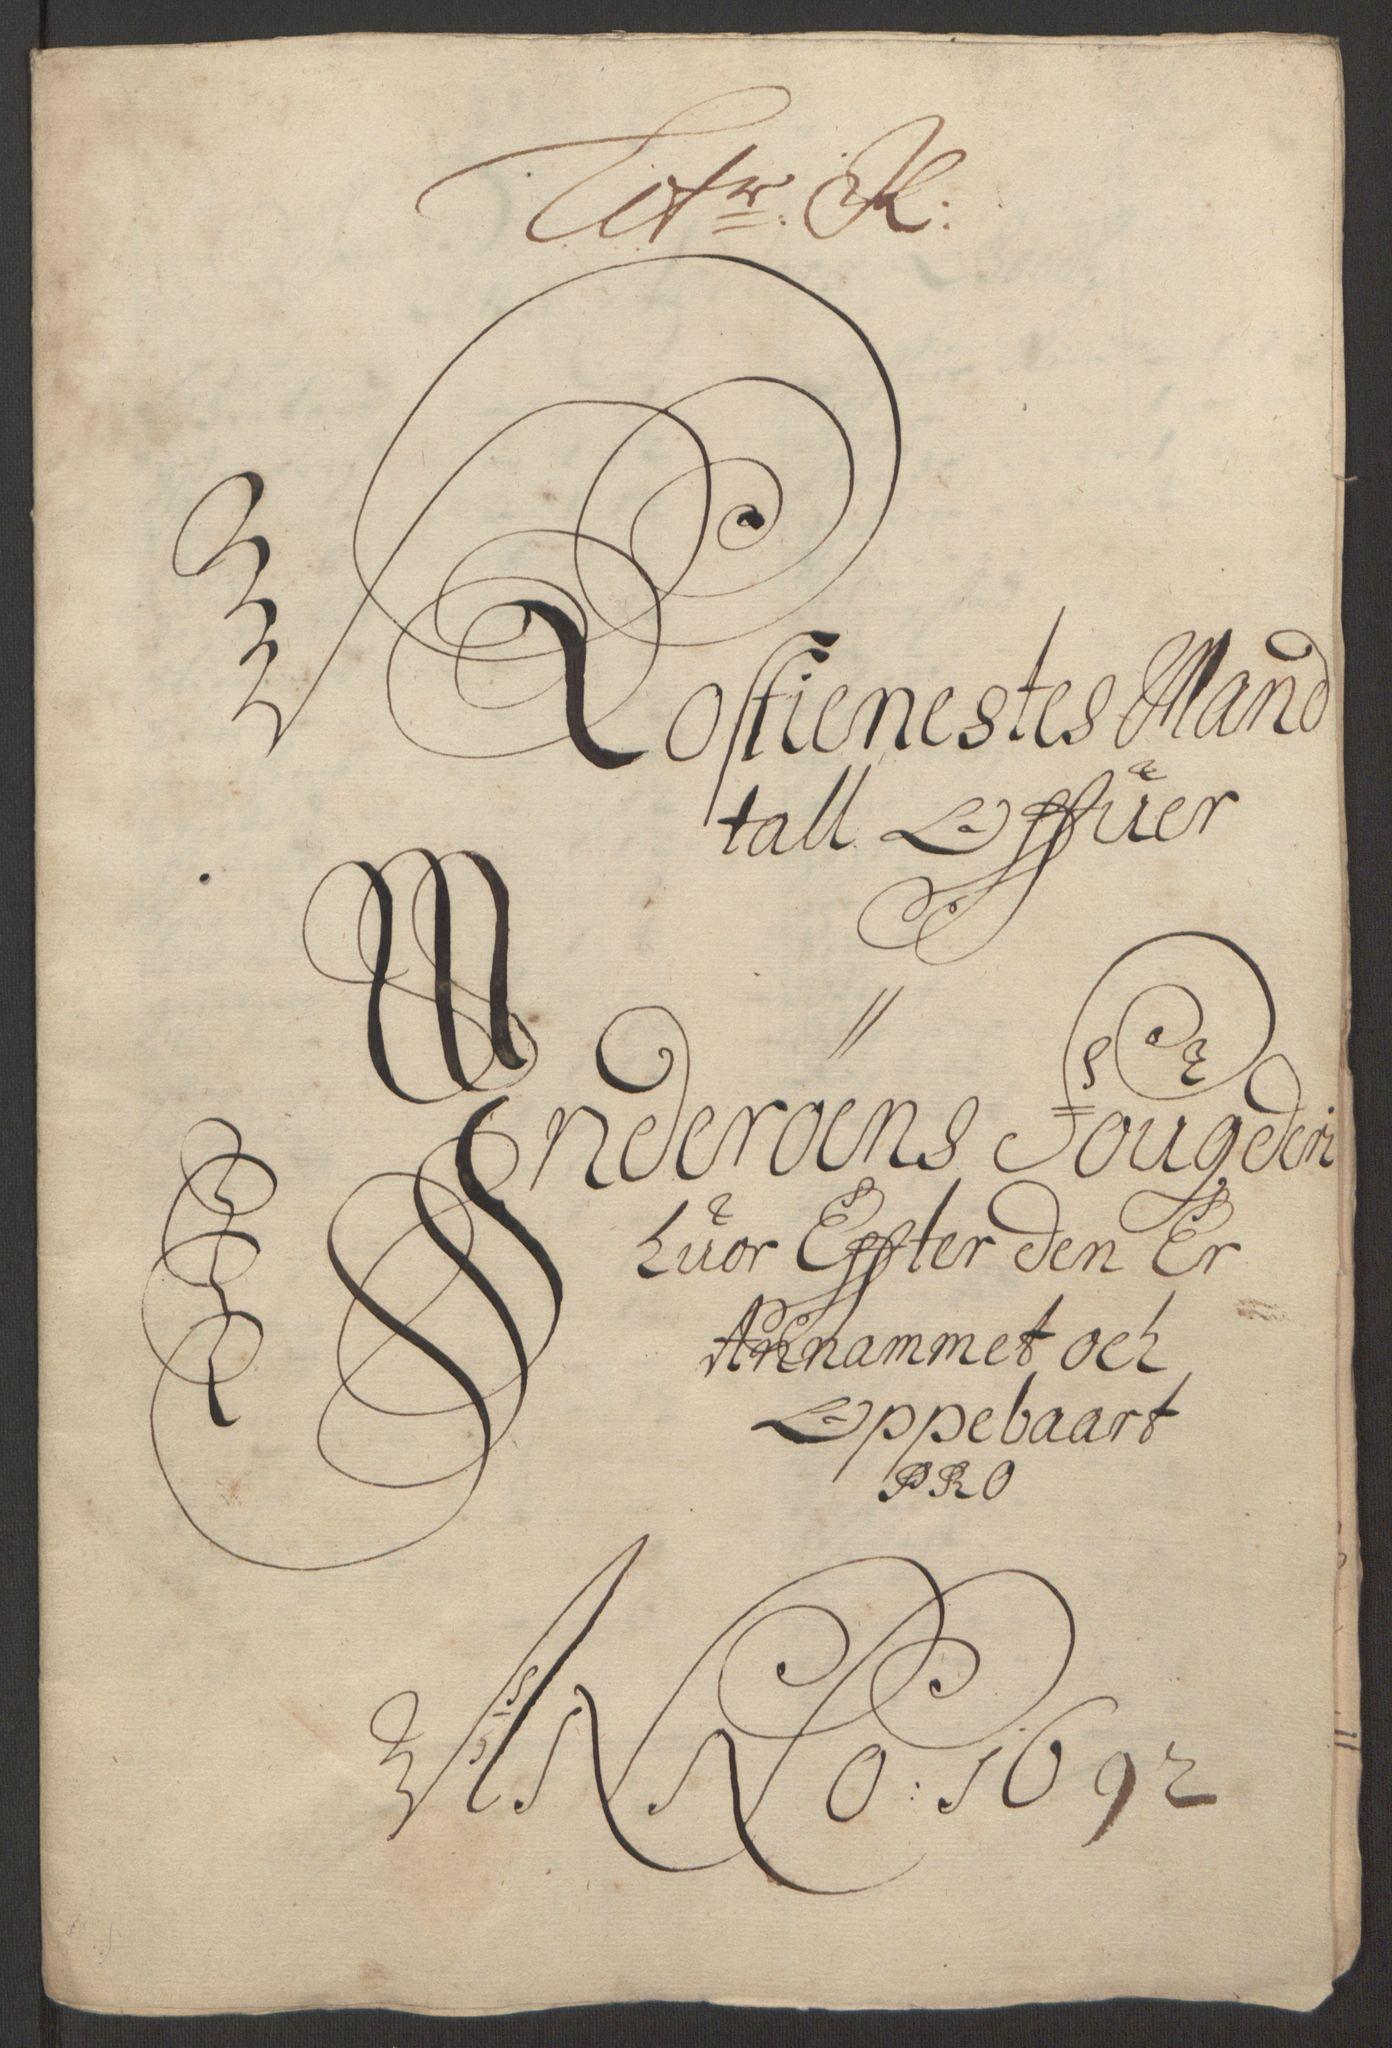 RA, Rentekammeret inntil 1814, Reviderte regnskaper, Fogderegnskap, R63/L4308: Fogderegnskap Inderøy, 1692-1694, s. 152